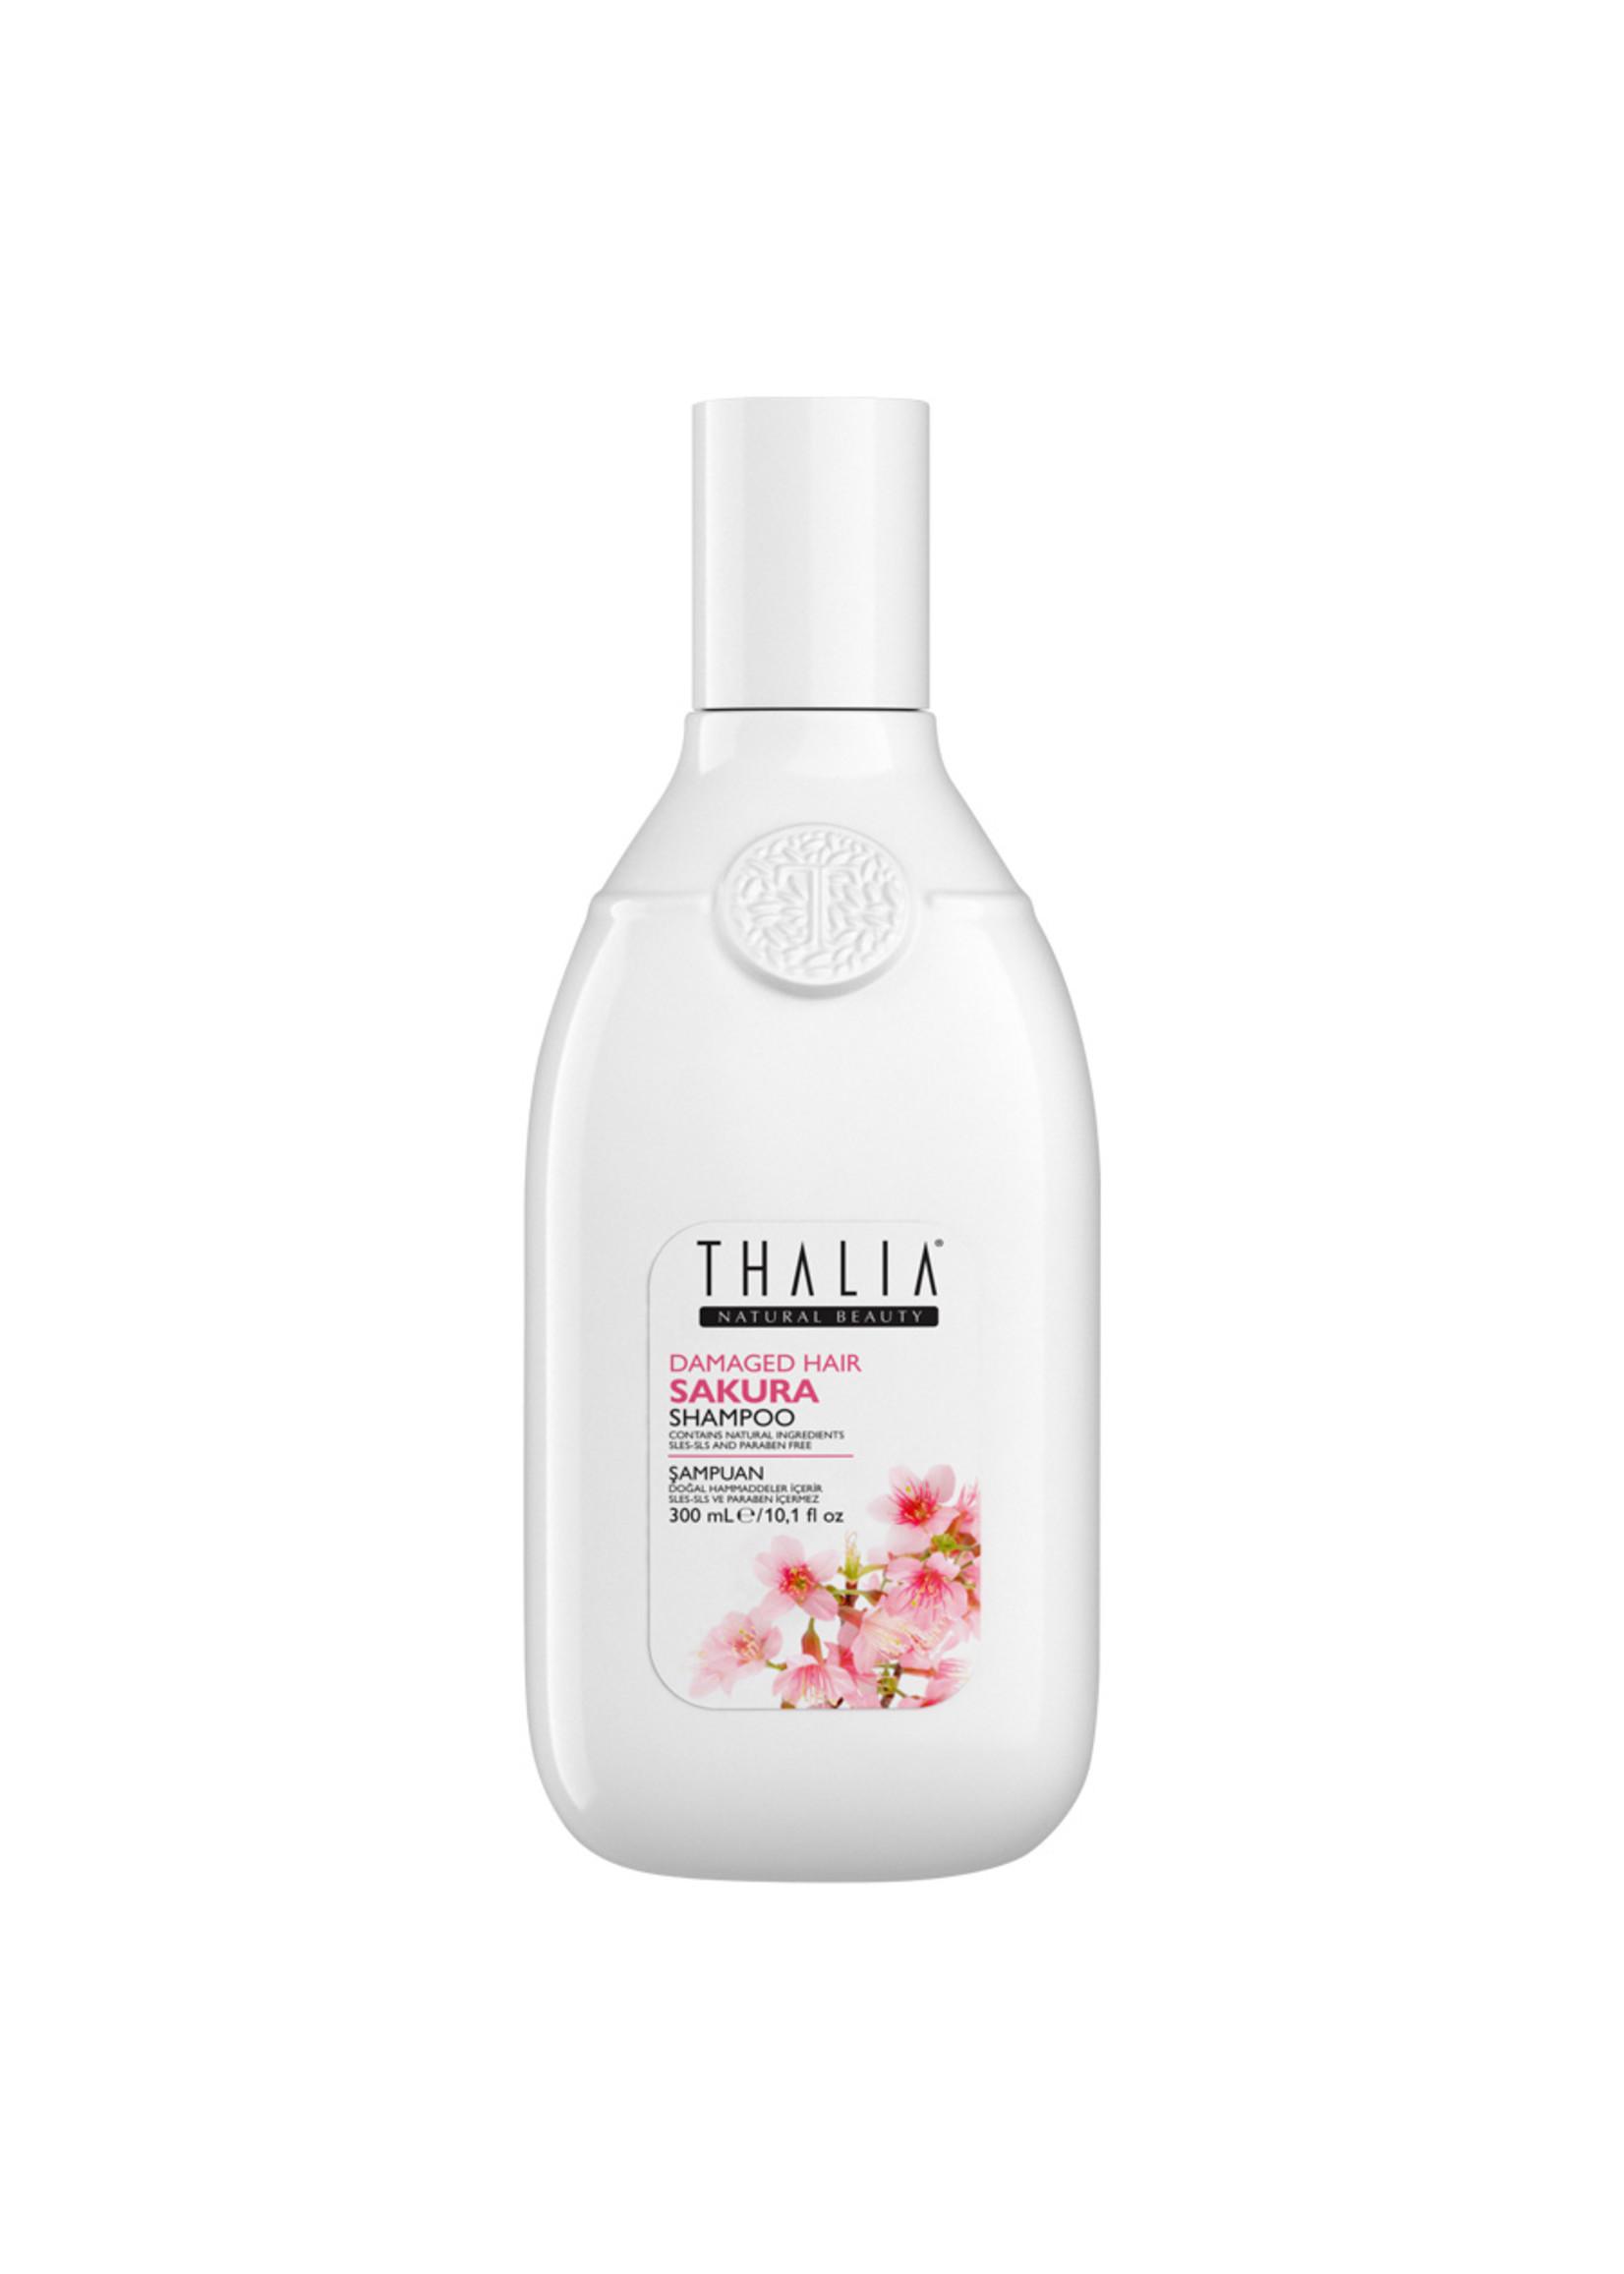 Thalia Sakura Shampoo 300 ml